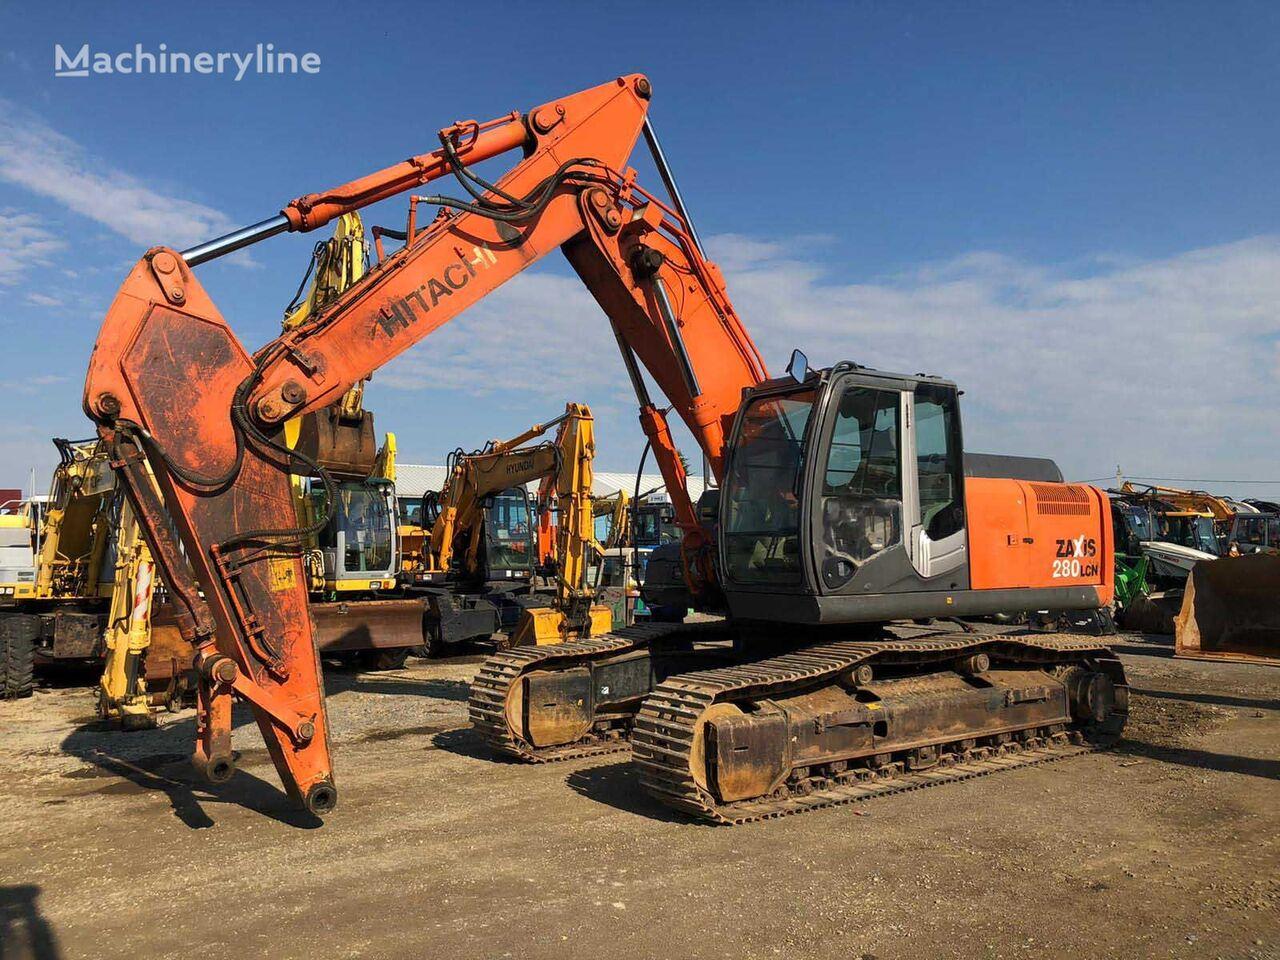 HITACHI ZX 280 LCN-3 tracked excavator